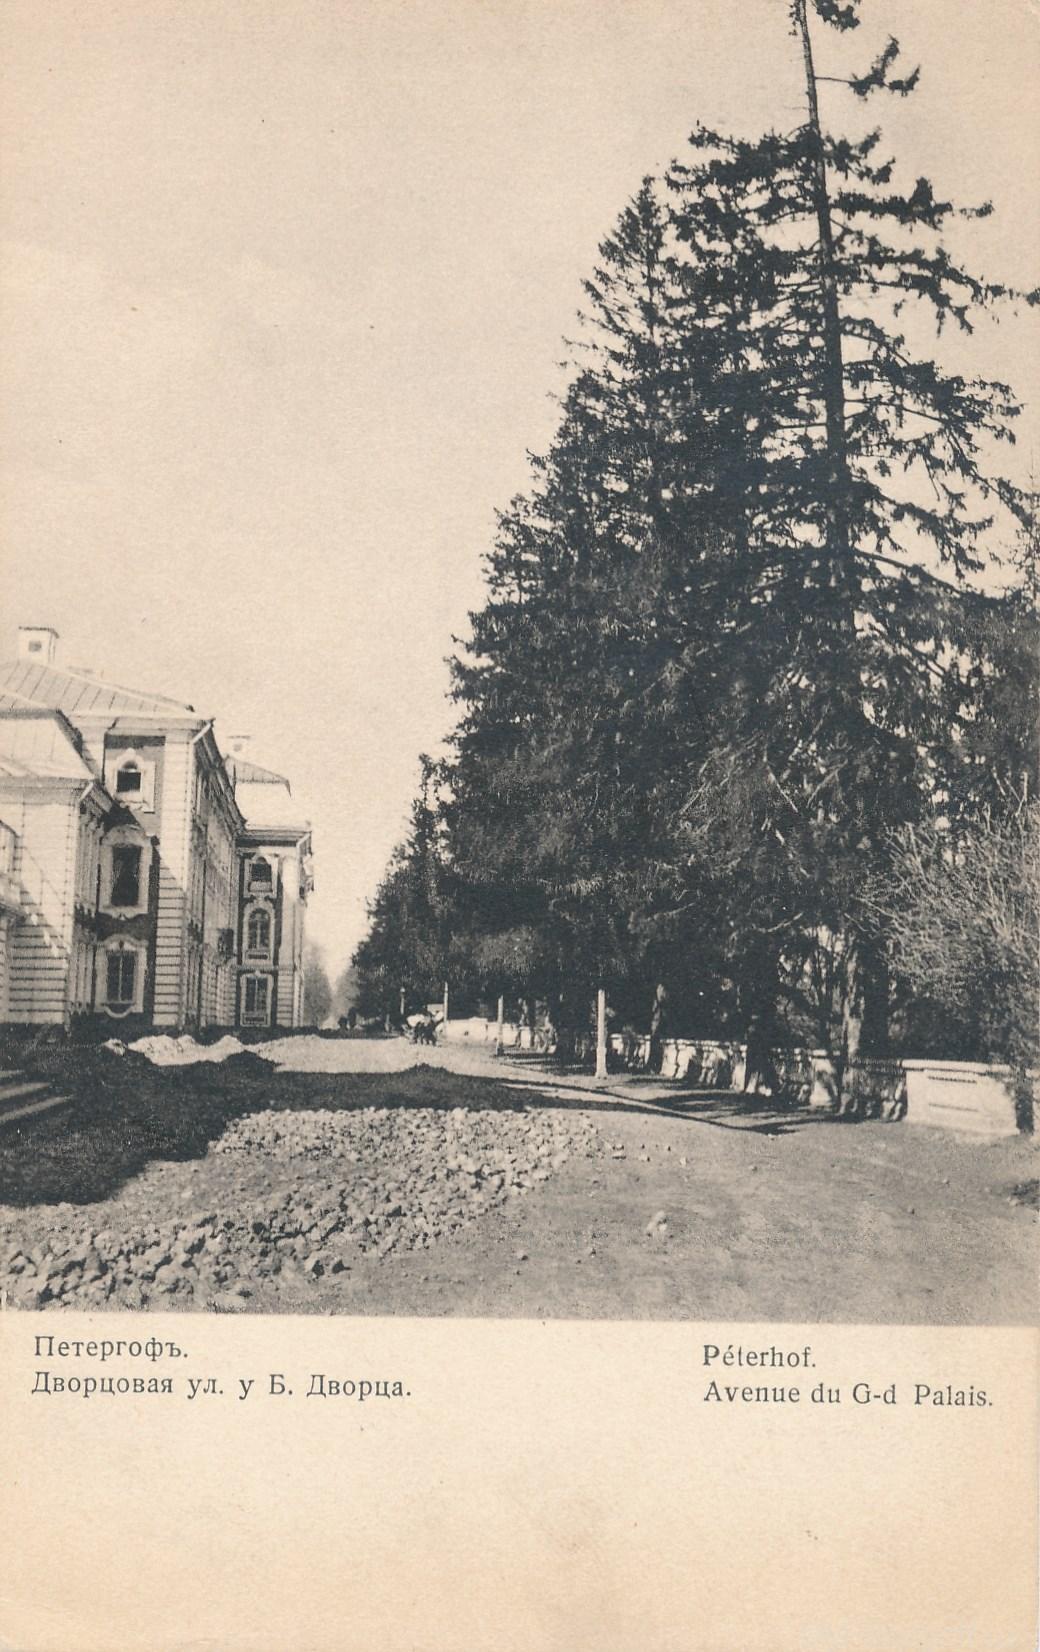 Дворцовая улица у Большого дворца